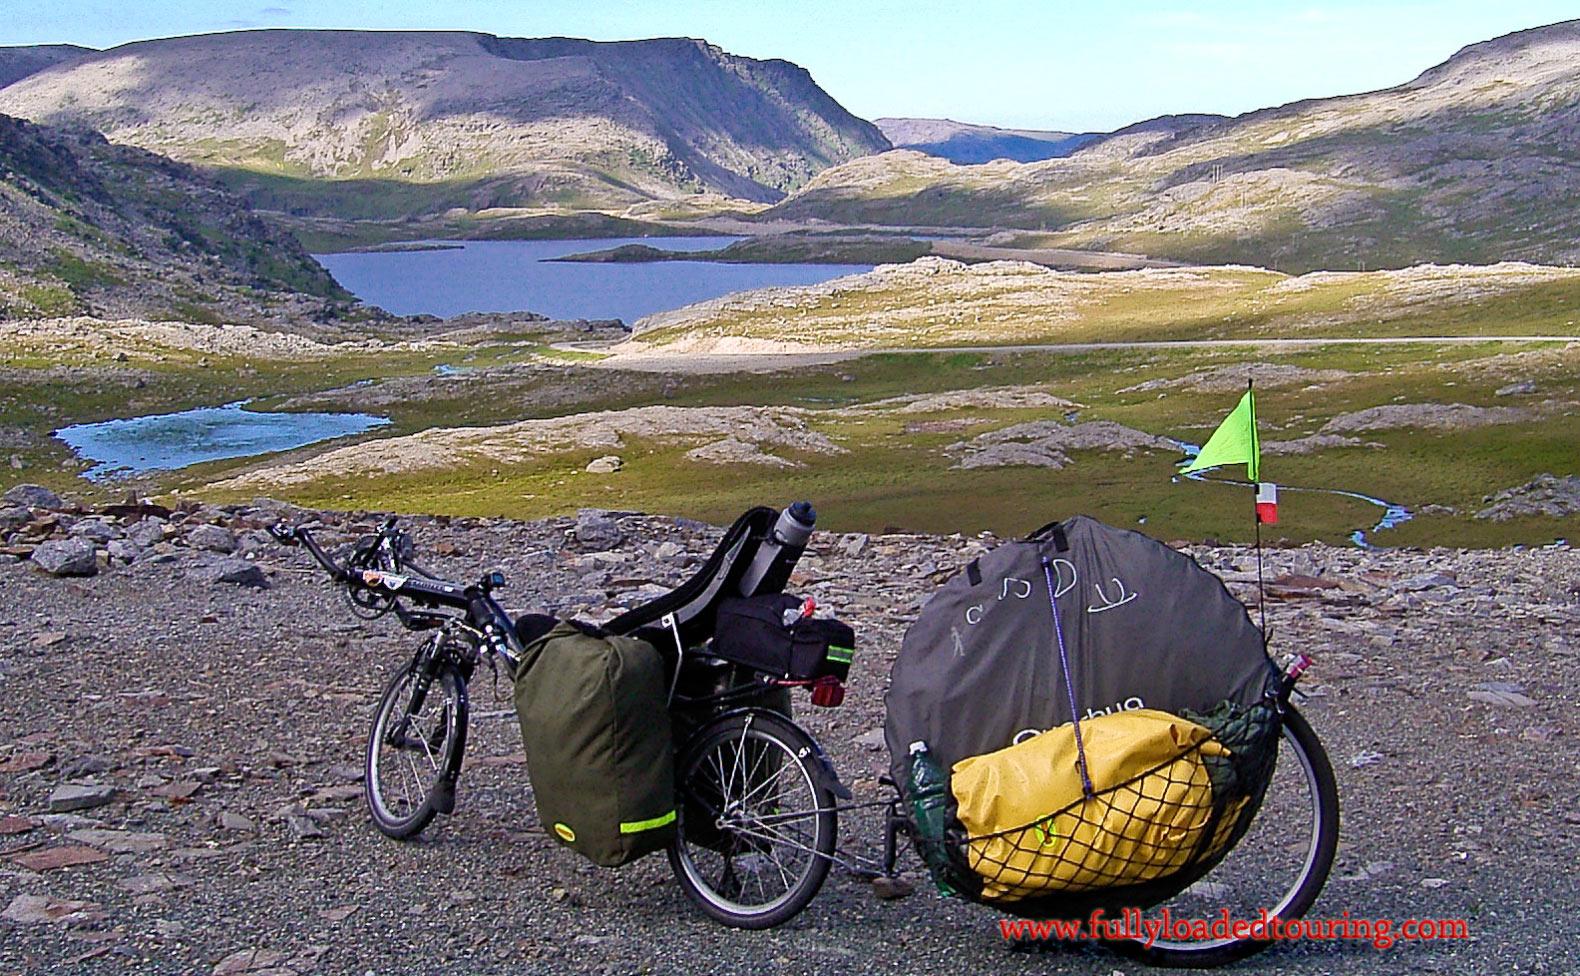 356    Bartek - Touring Norway - Mistral Challenge touring bike